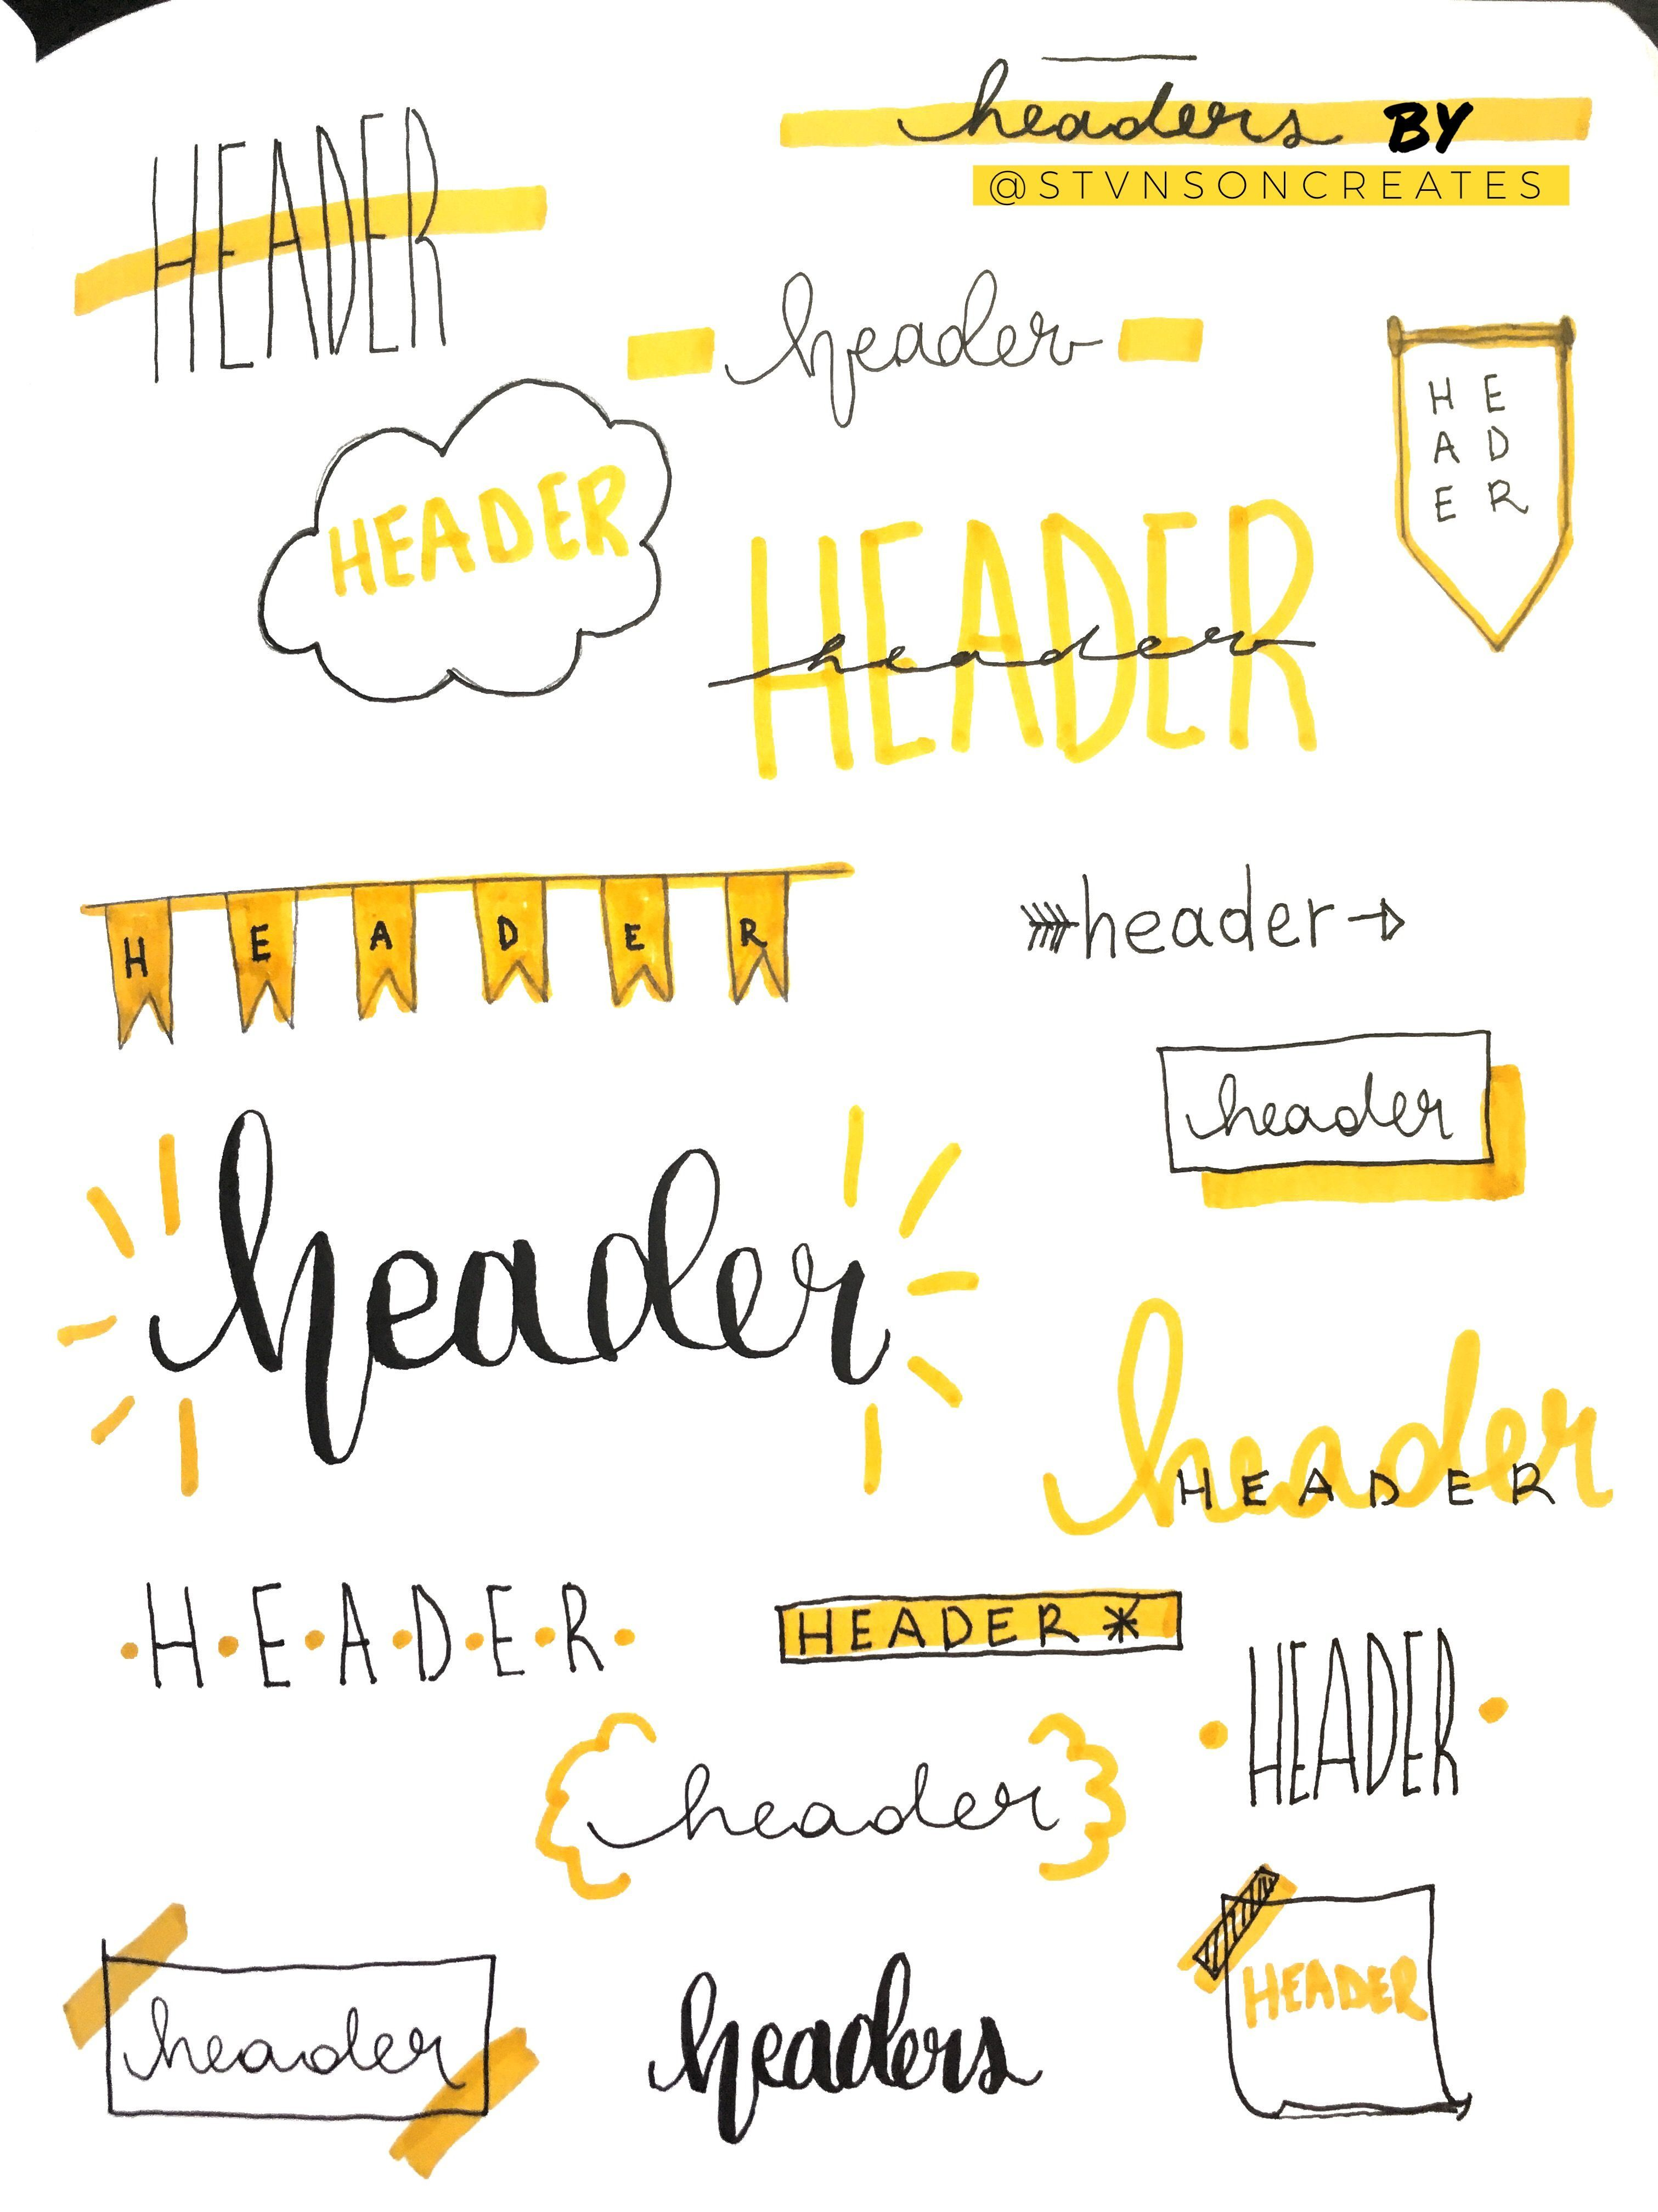 Yellow Headers -   - #BulletJournal #CleaningHacks #CleaningTips #headers #SurvivalGear #Woodworking #WoodworkingShop #yellow #aestheticnotes